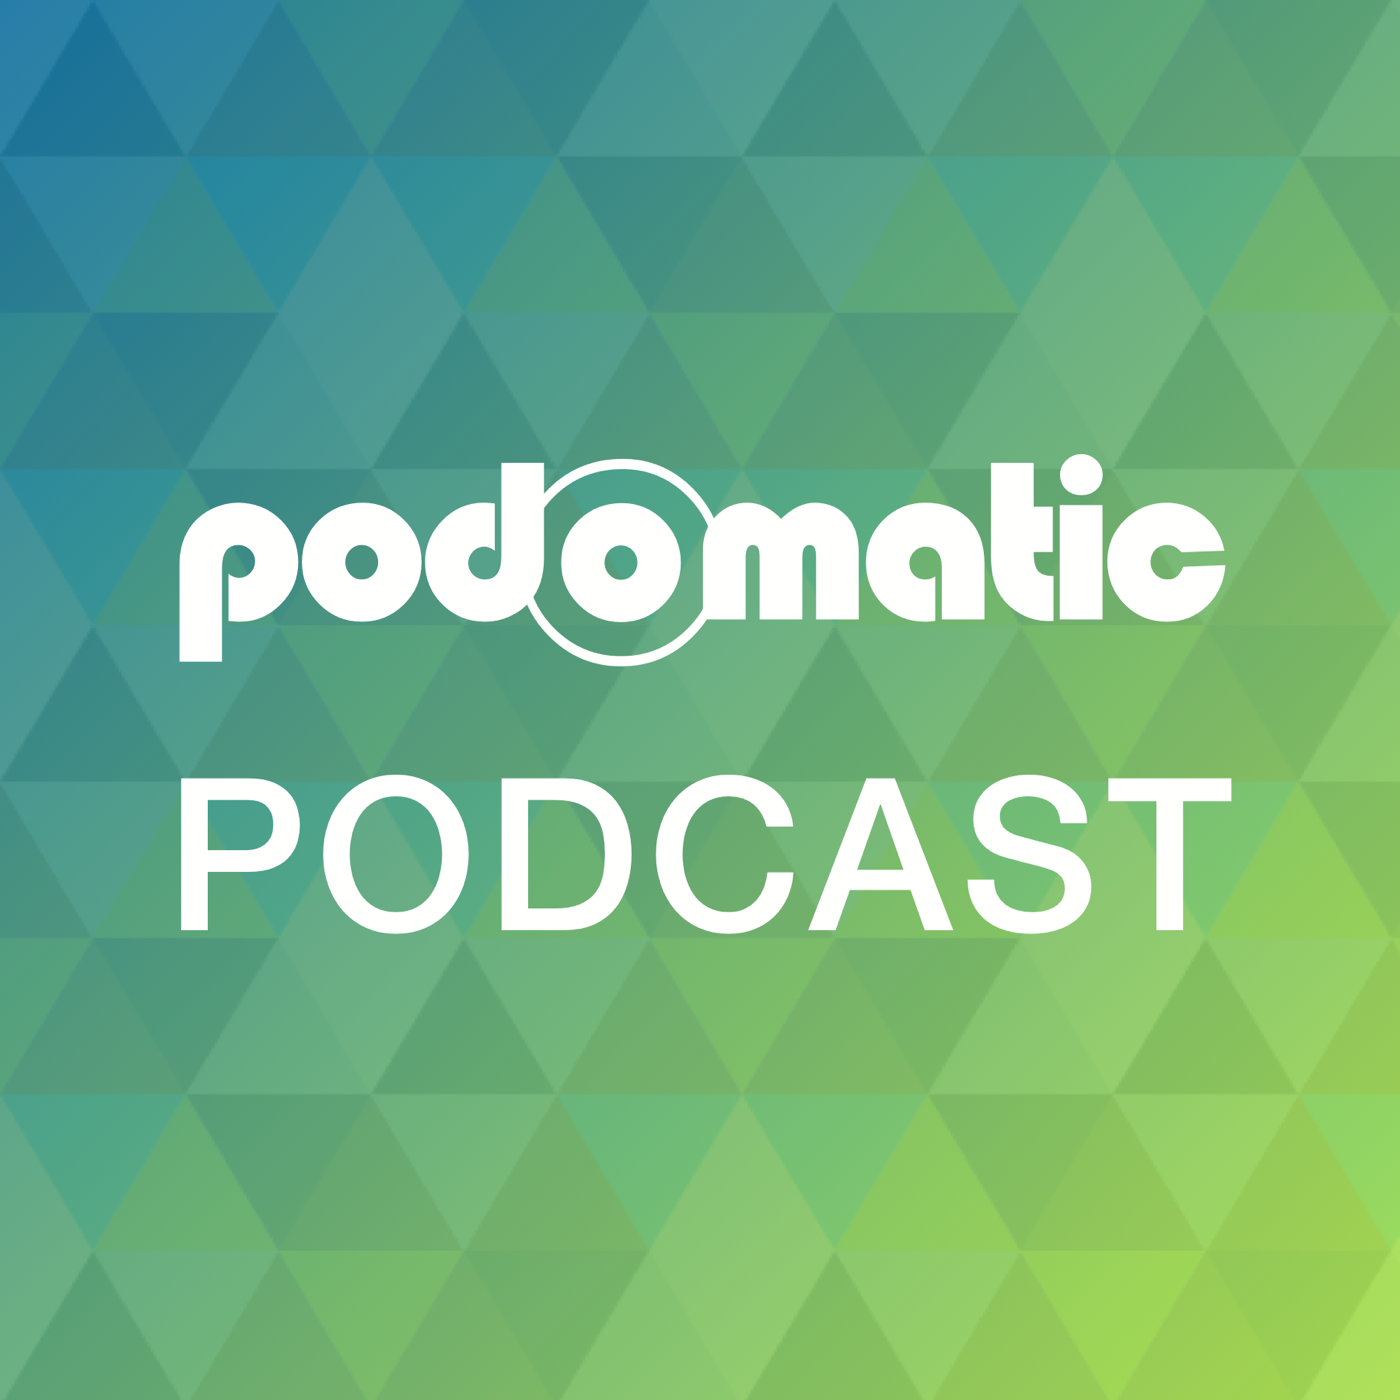 Nandini Mohan's Podcast